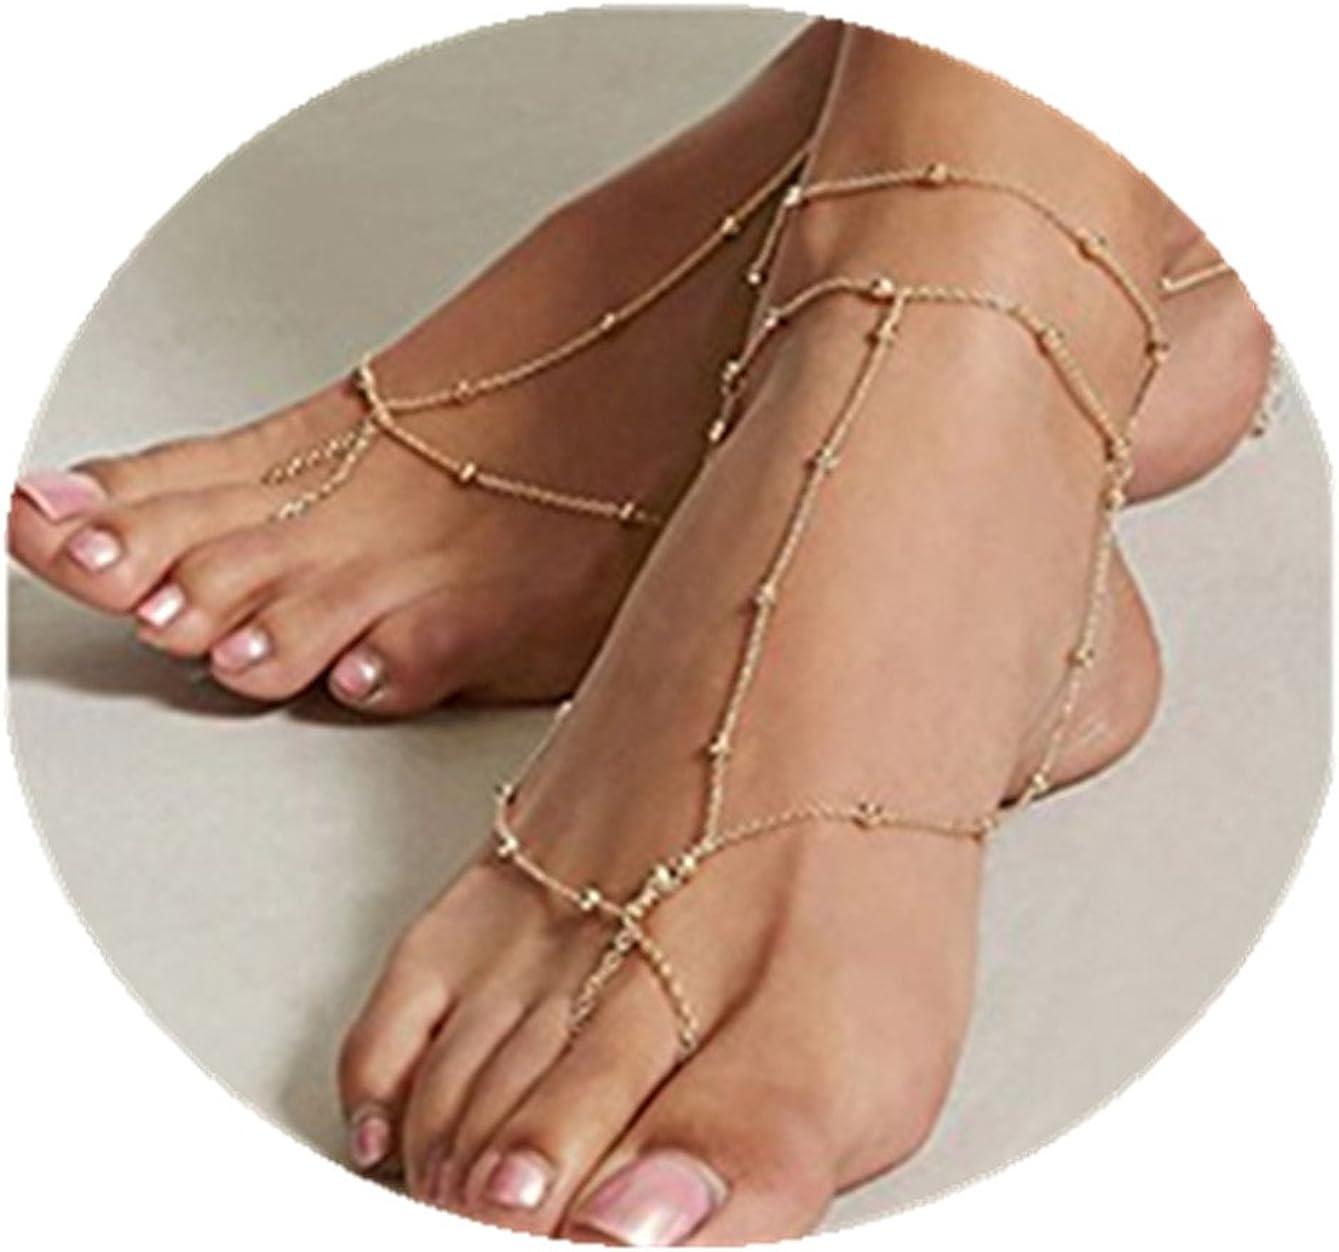 Crochet hippie shoes Grey Hippie Shoes bellydance Barefoot Sandals Boho barefoot sandal Gypsy Bellydance Shoes gypsy sandals yoga